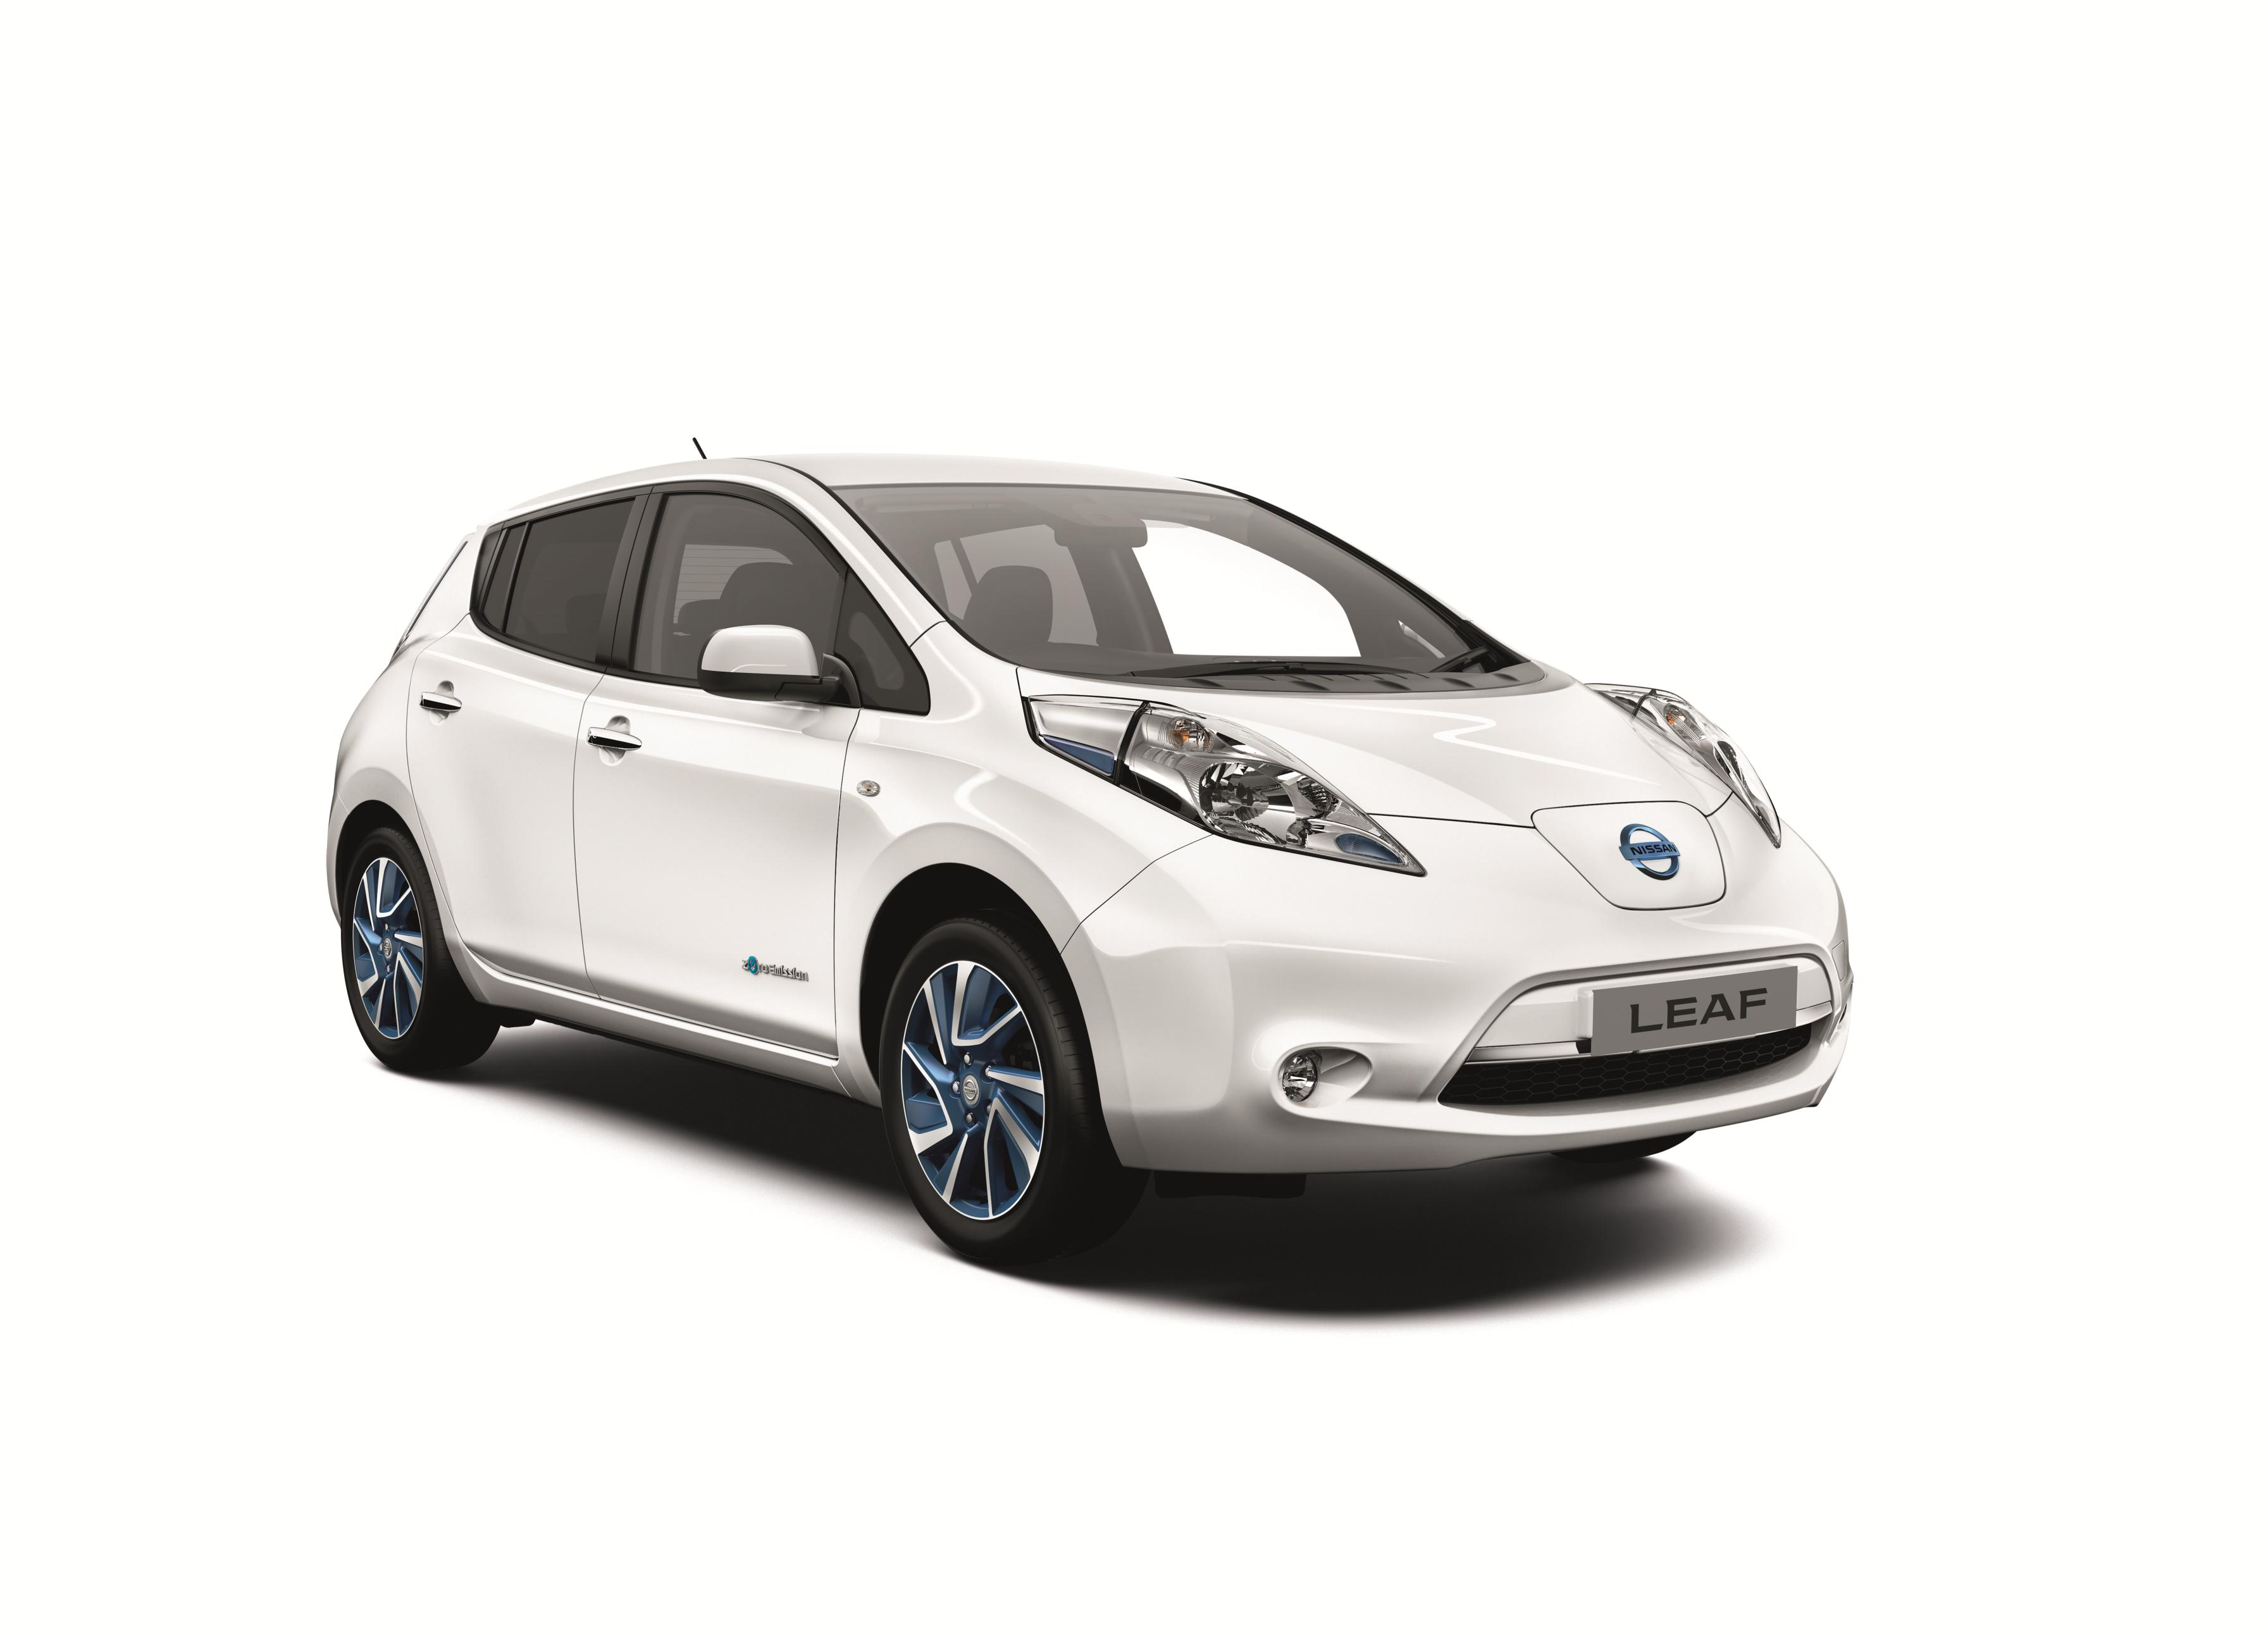 s wired electric its autonomous license nissan test car passes robot ad